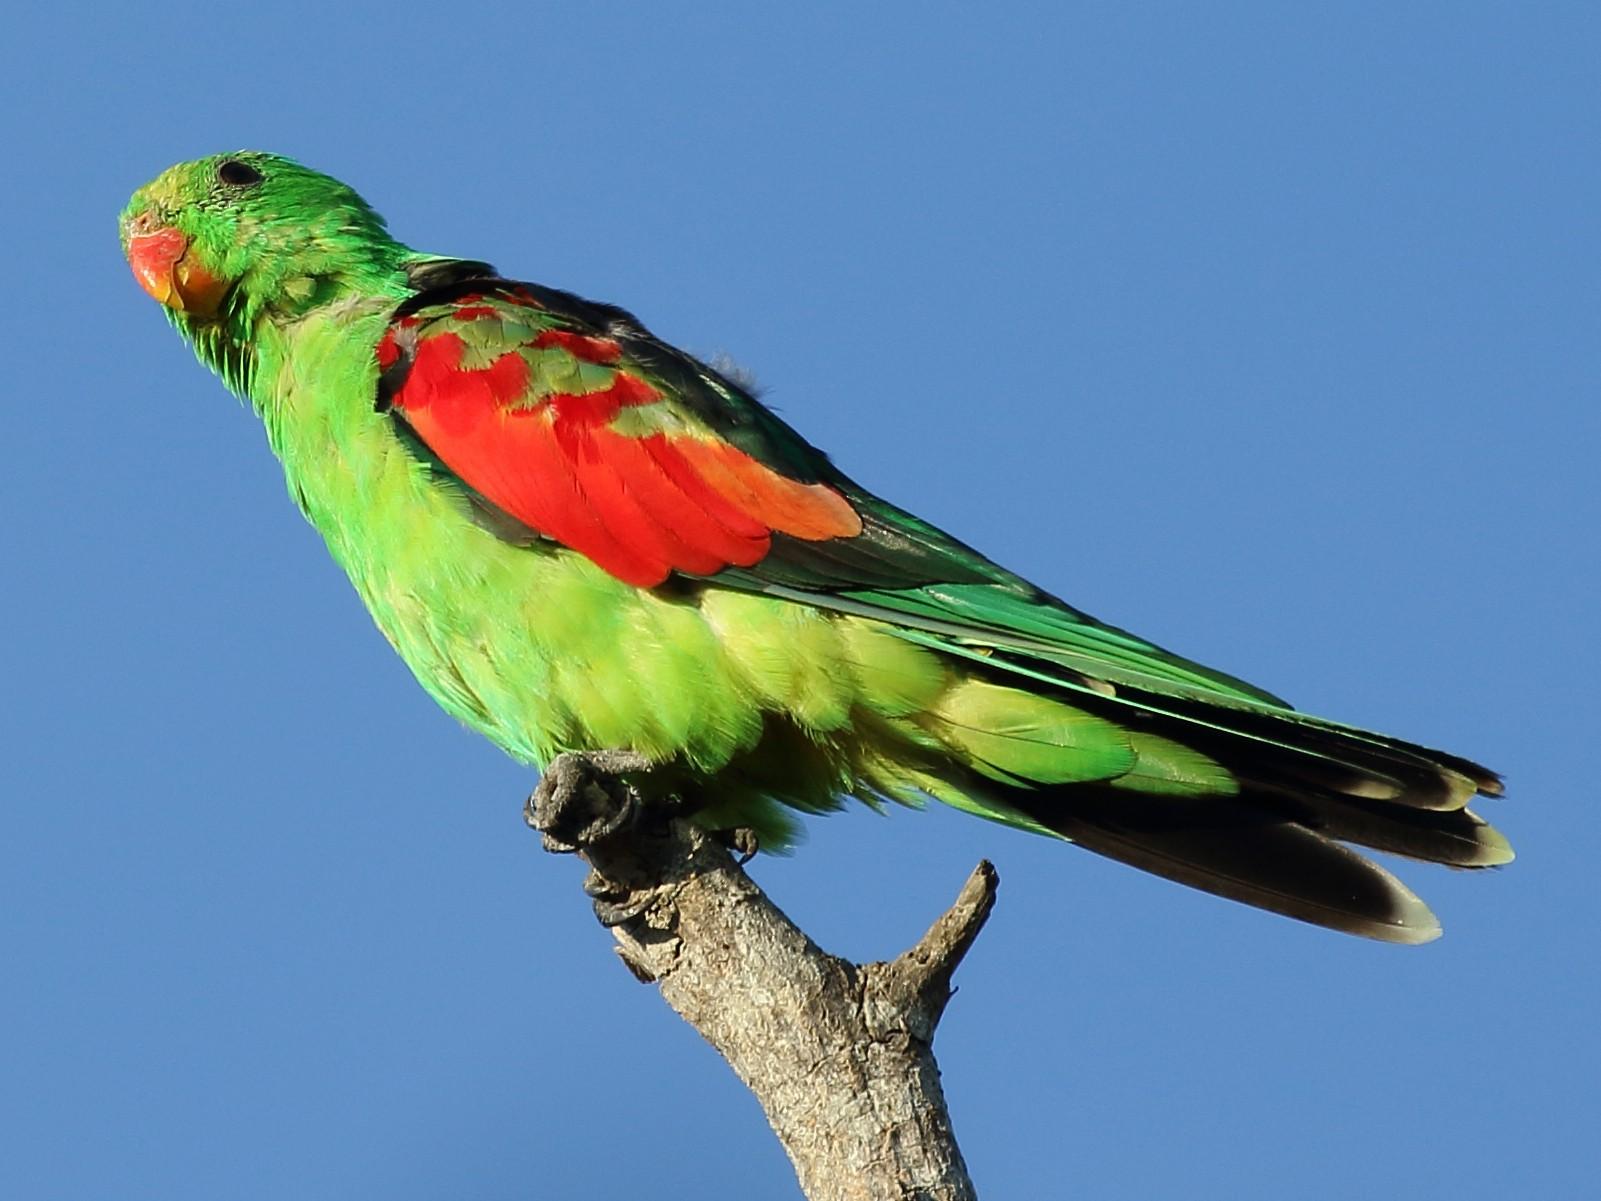 Red-winged Parrot - Michael Rutkowski